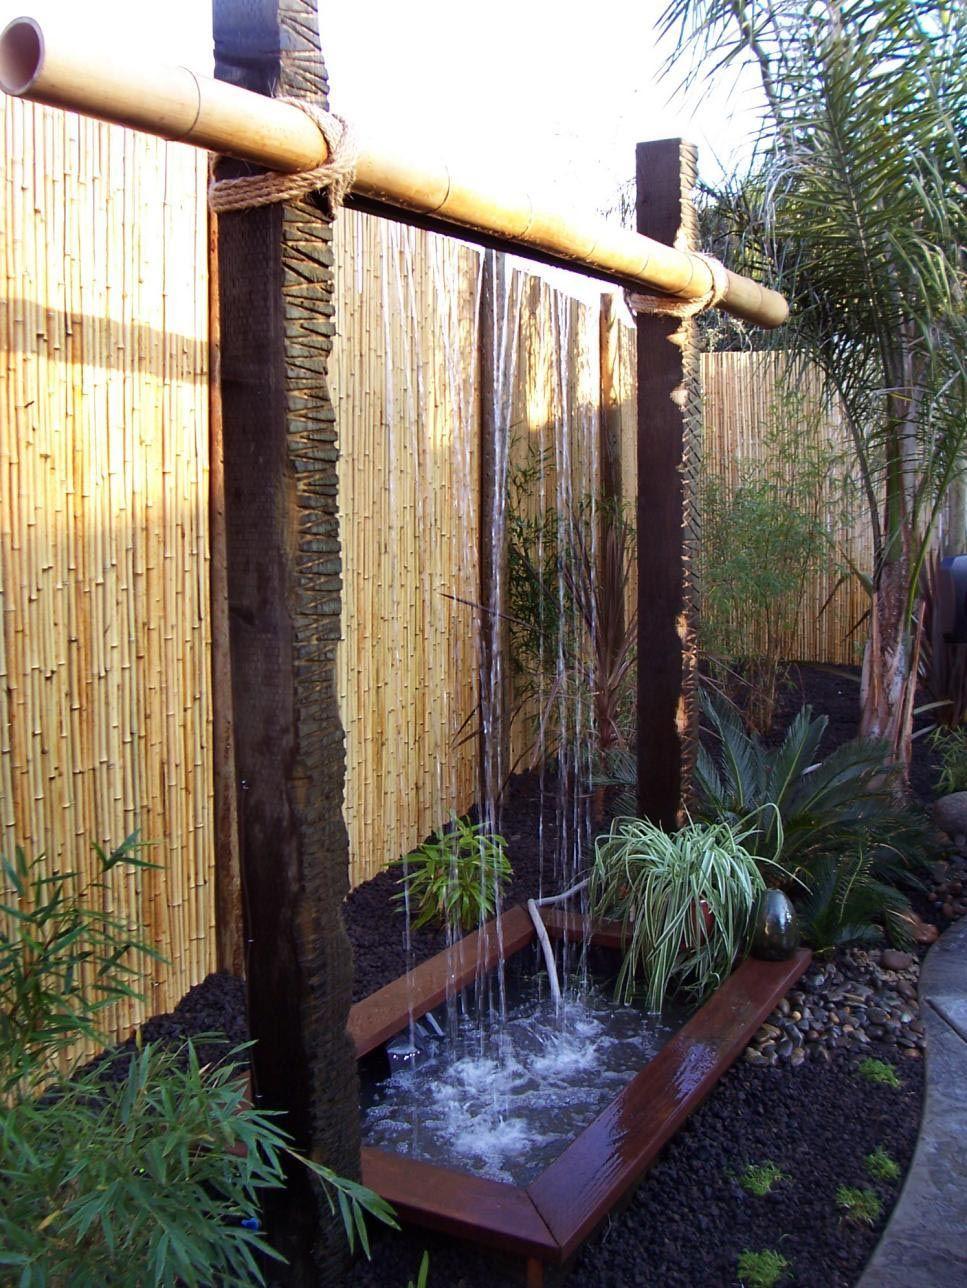 Backyard Water Feature Diy diy backyard water feature | outdoor fountains | pinterest